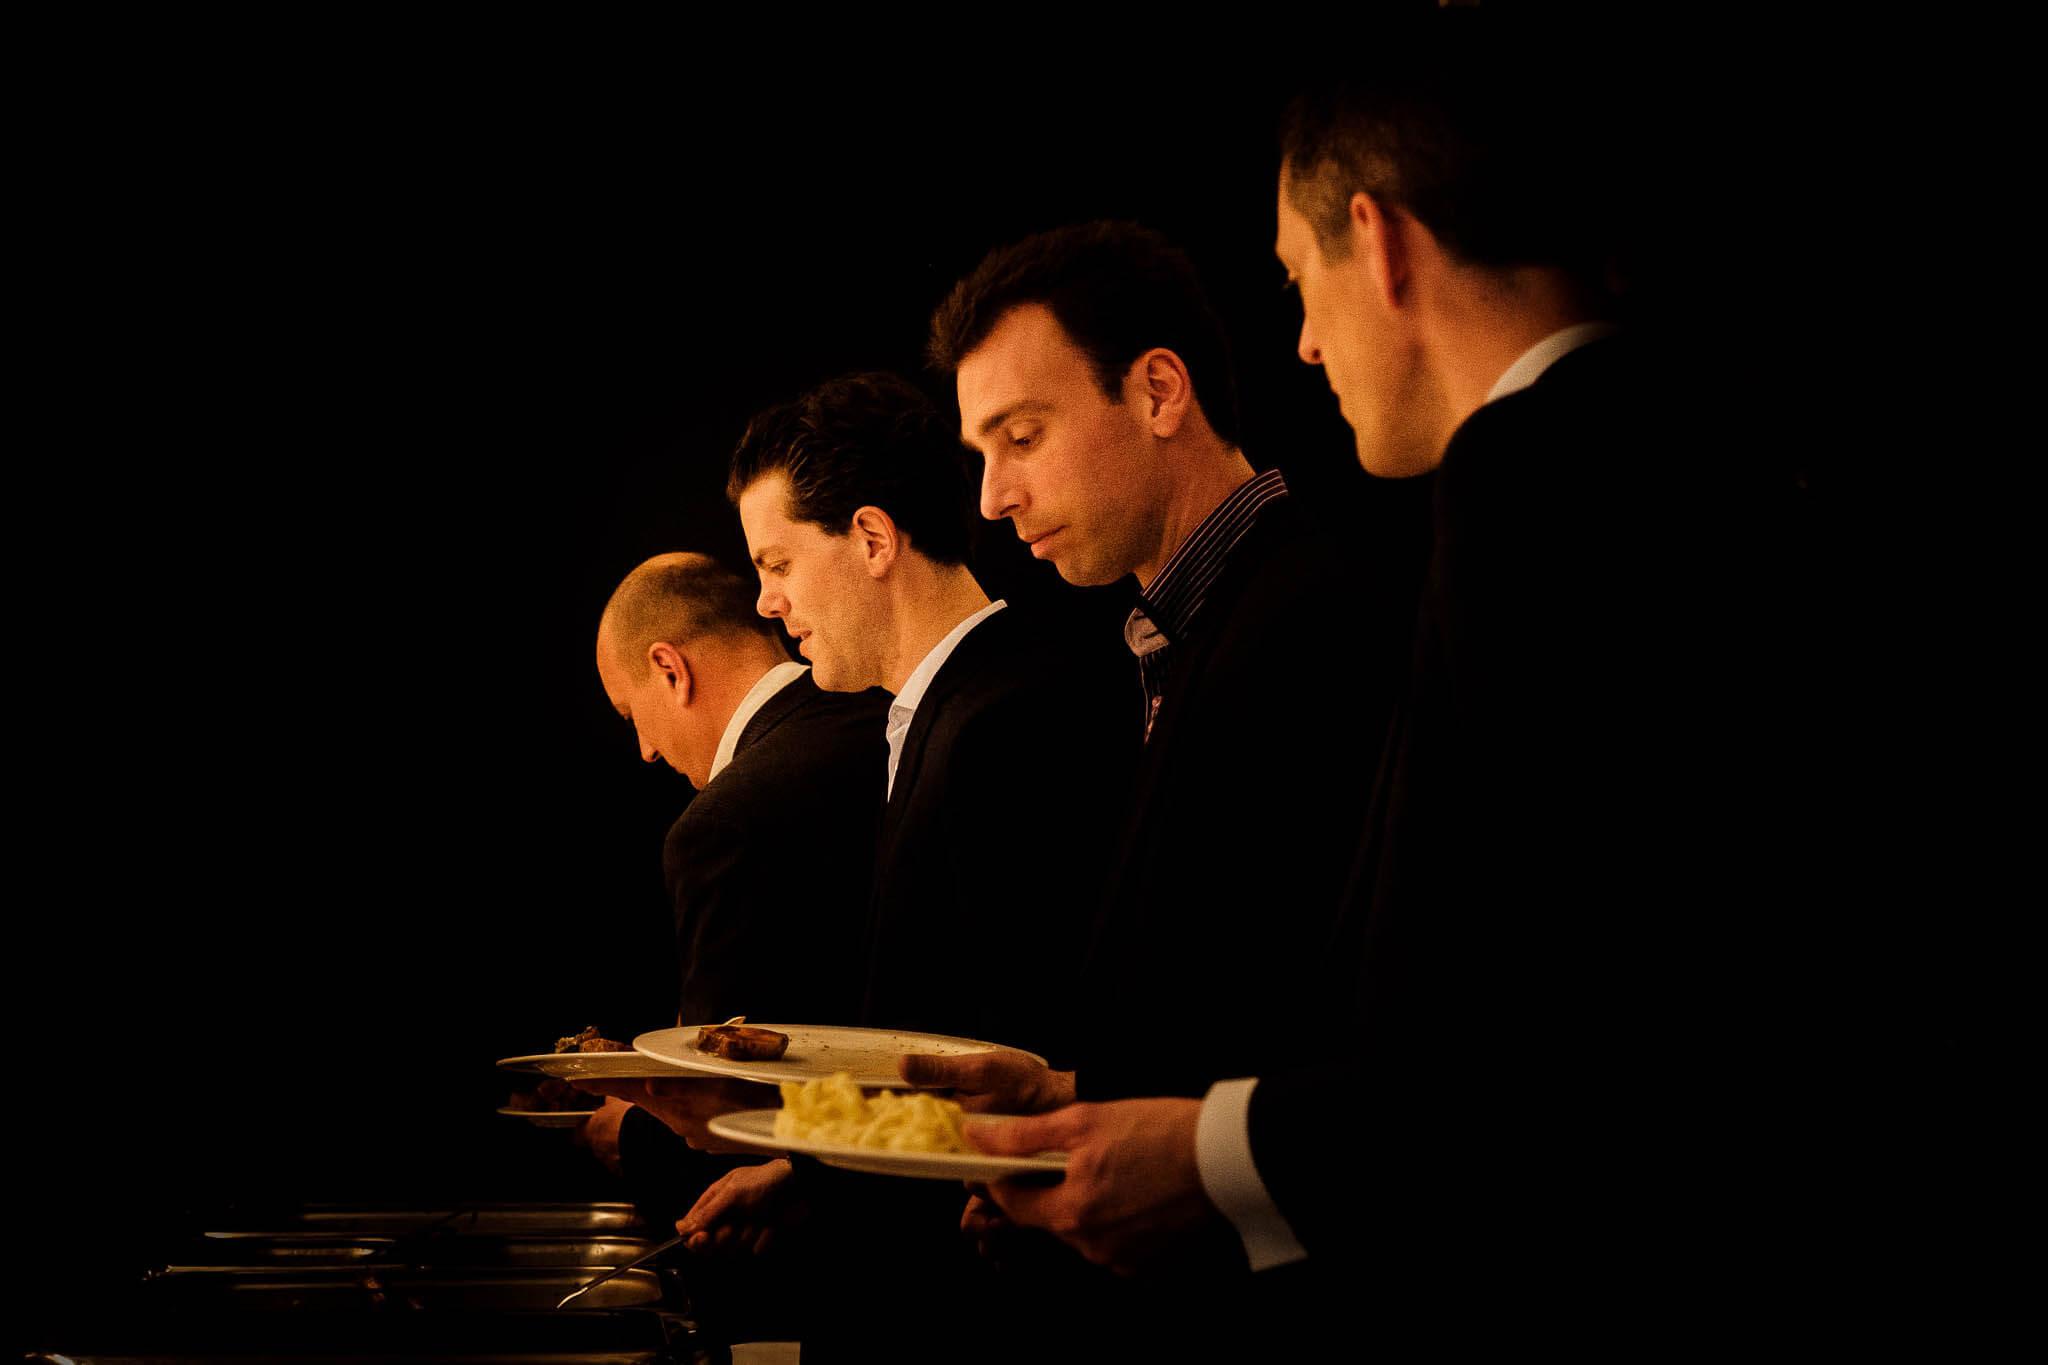 Diner bruiloft mannen Ulvenhart Peter Geluk bruidsfotografie